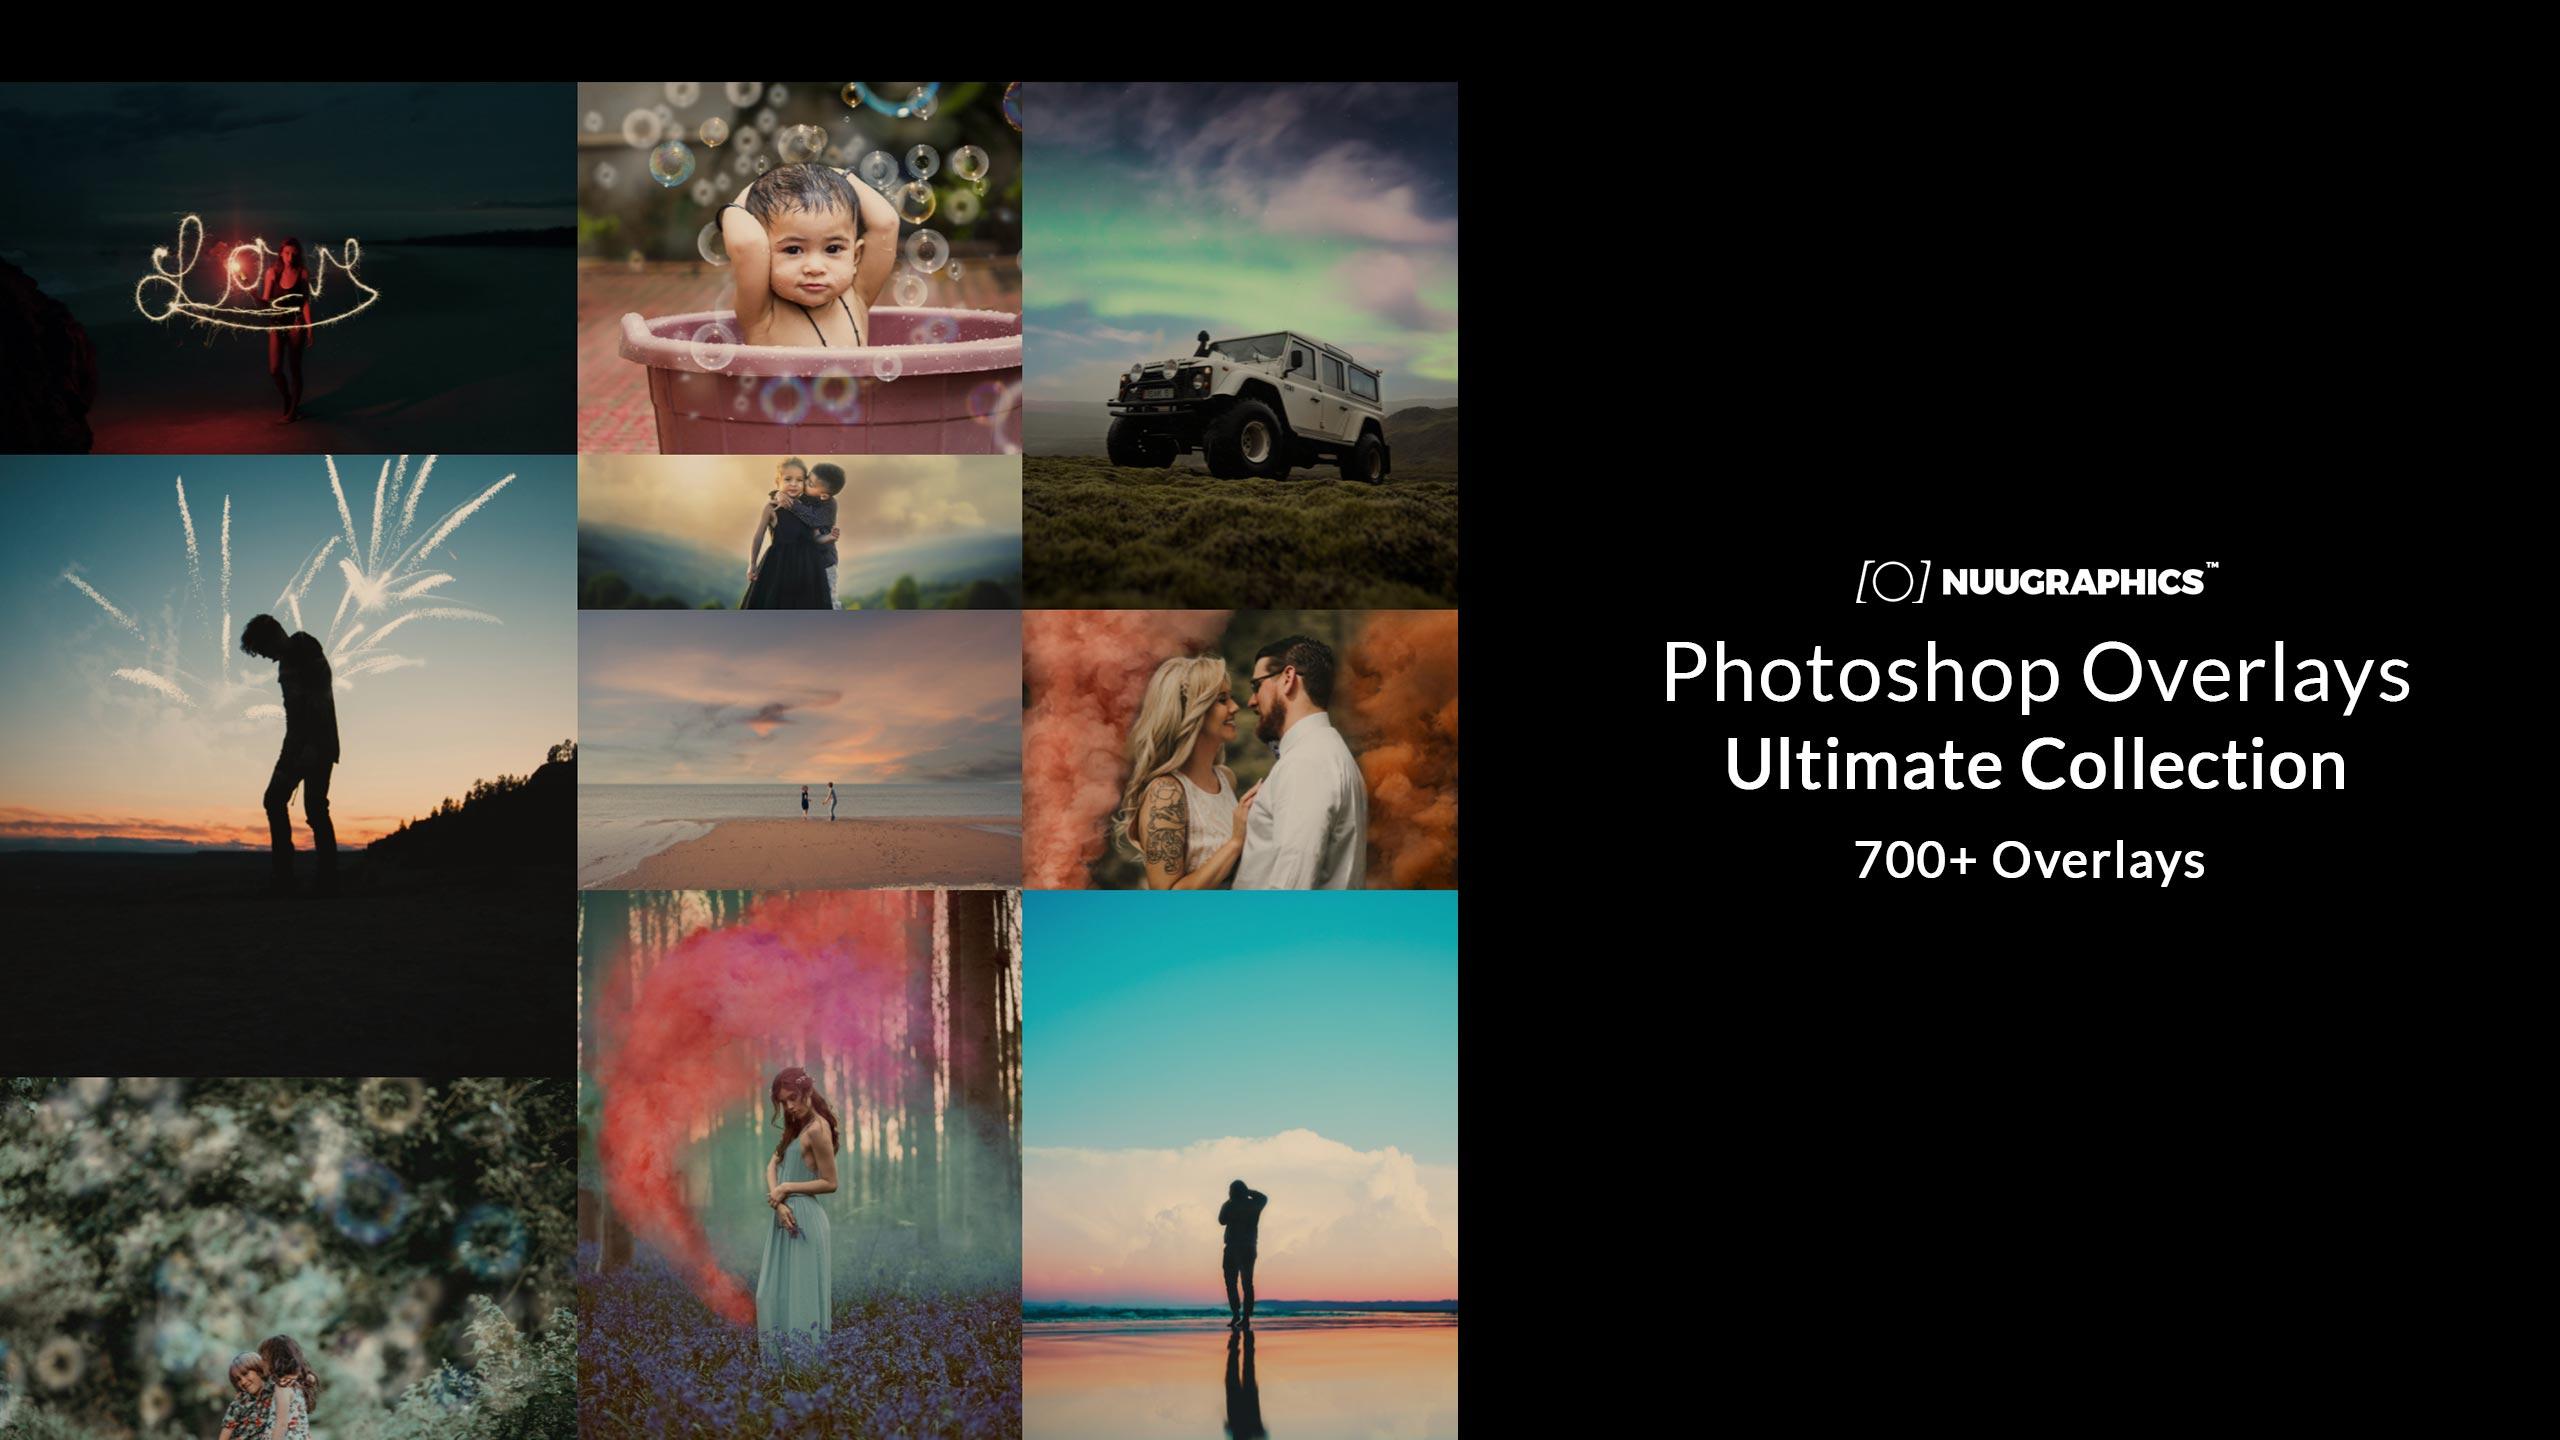 600+ Photoshop Overlays